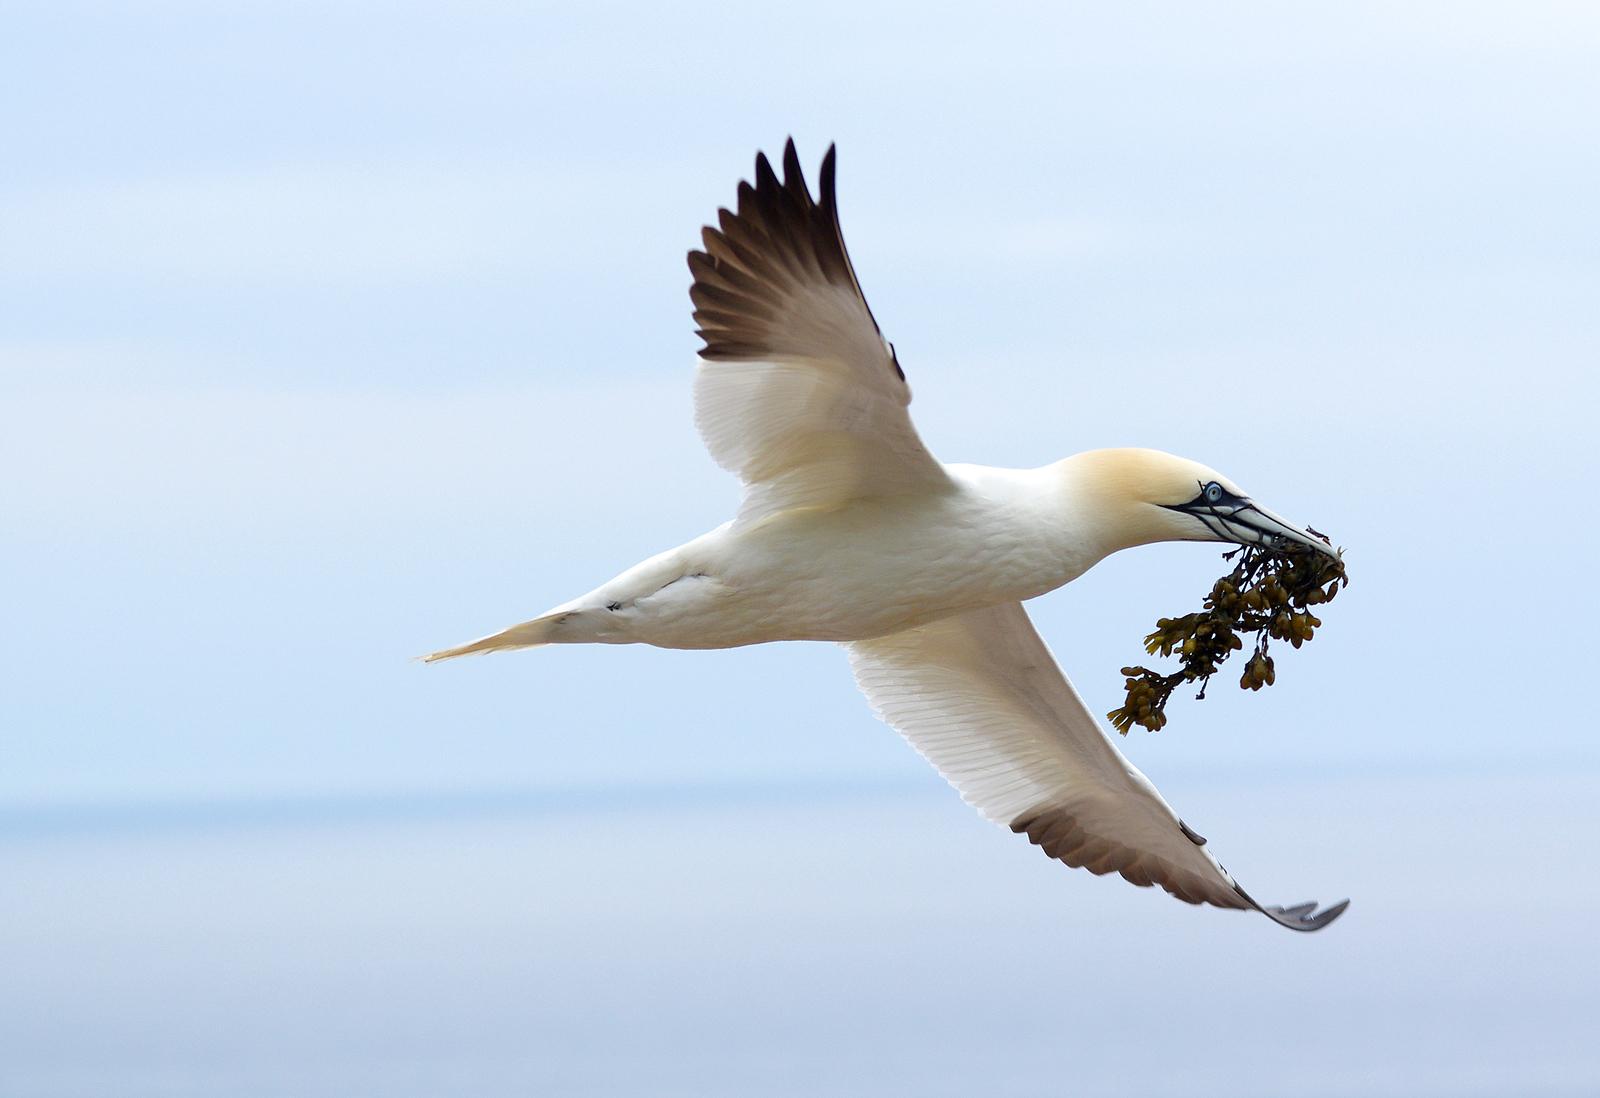 Northern gannet with nesting materials Bonaventure Island Quebec, Canada